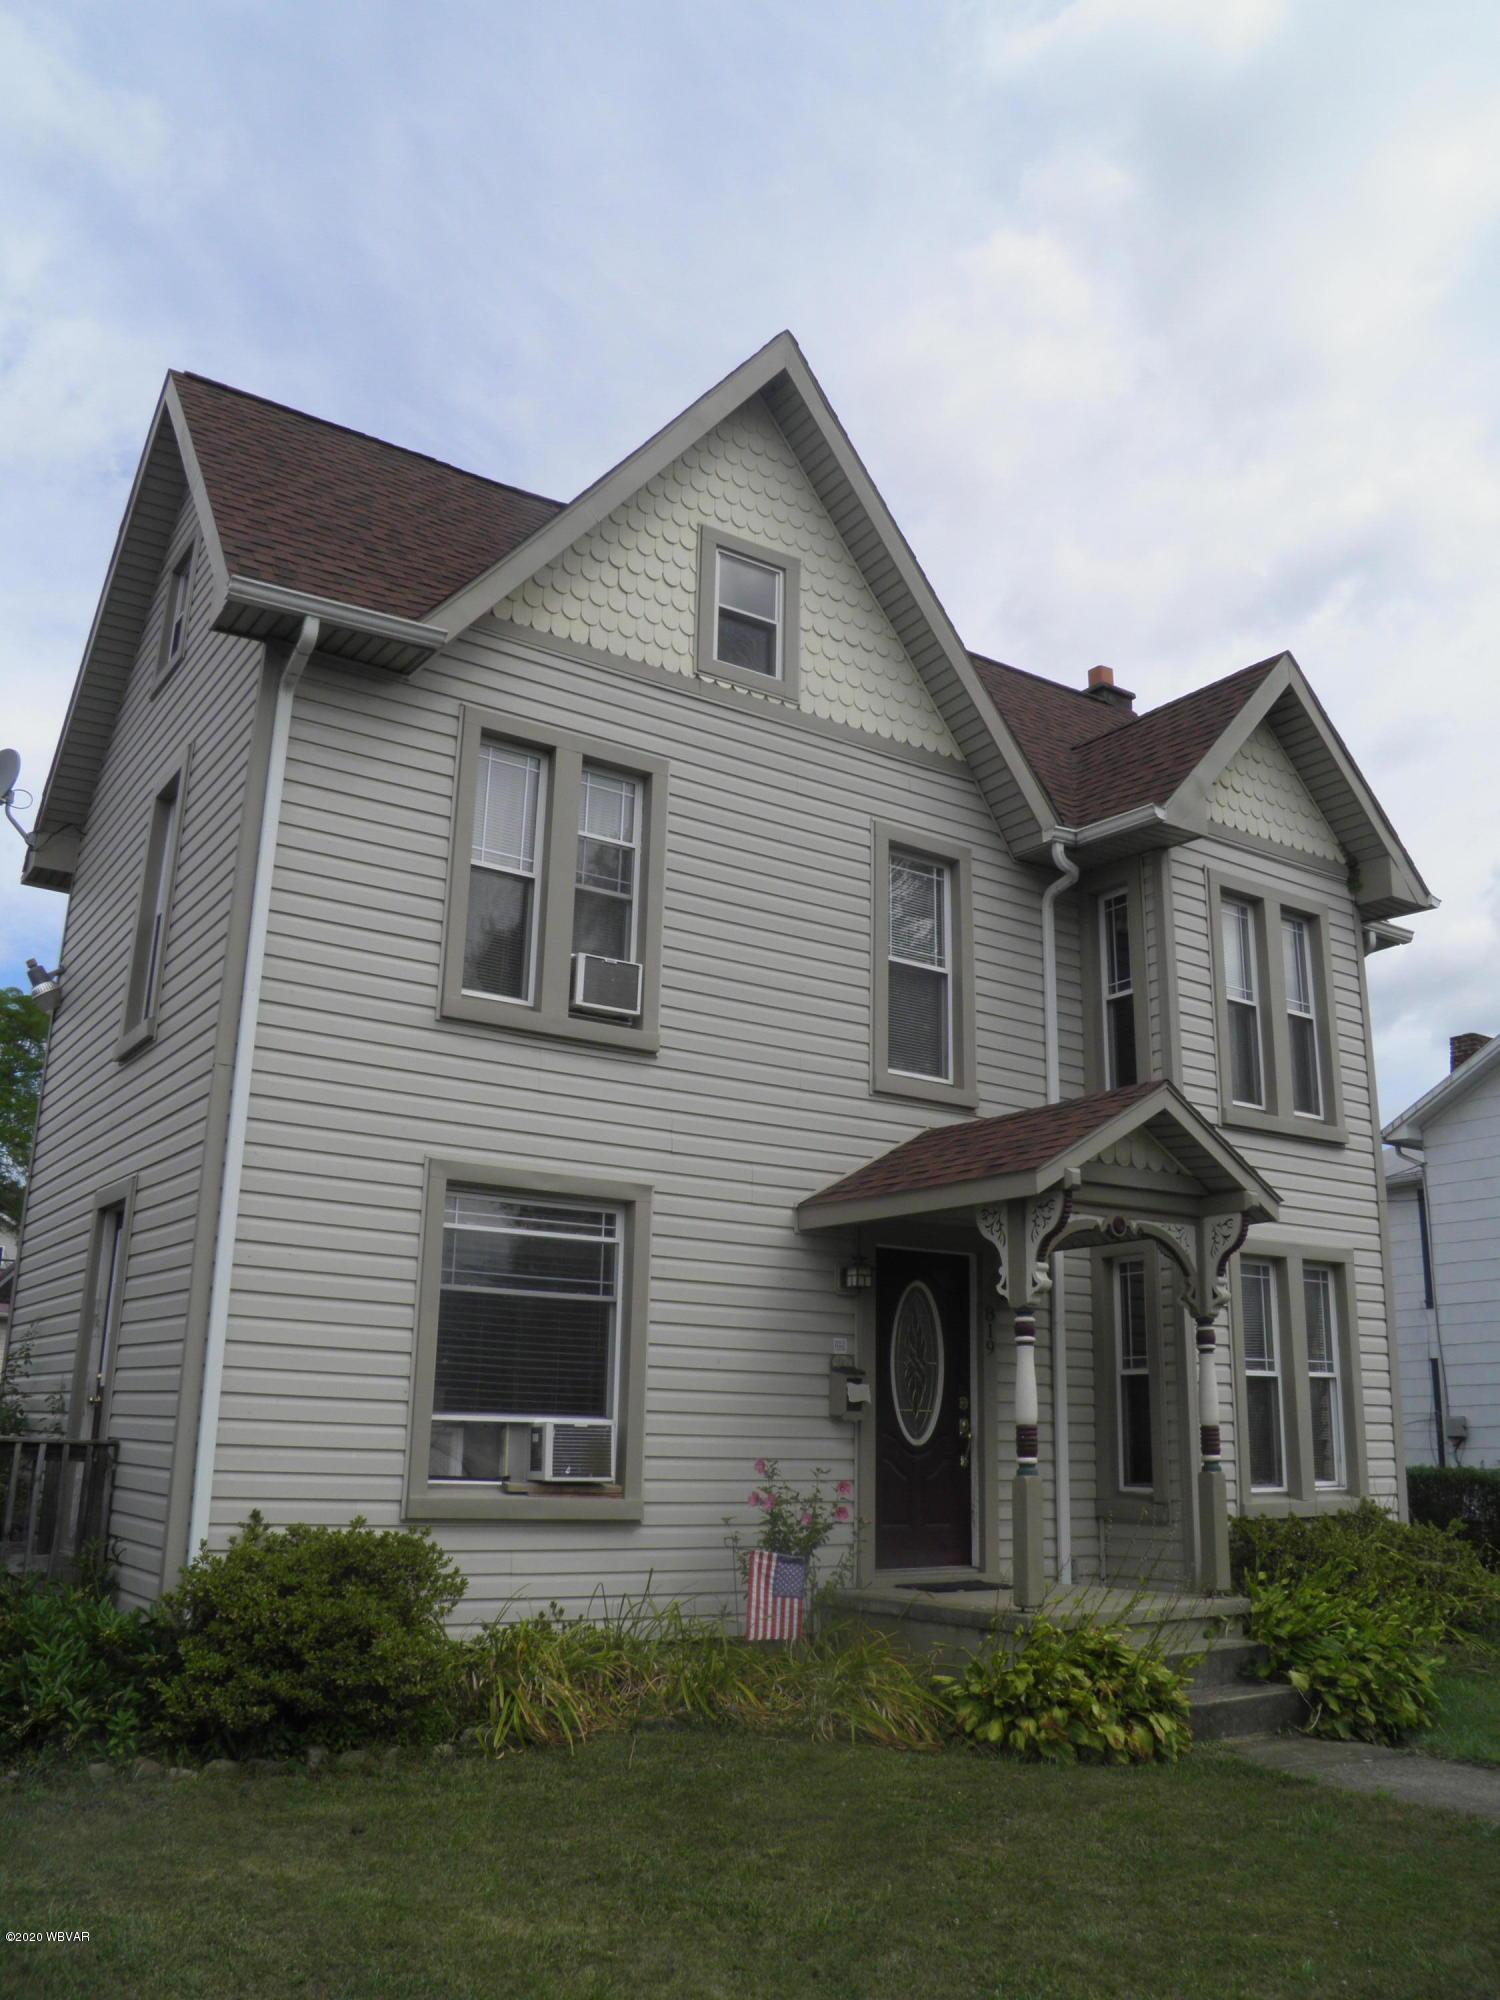 819 BELLEFONTE AVENUE, Lock Haven, PA 17745, 4 Bedrooms Bedrooms, ,2 BathroomsBathrooms,Residential,For sale,BELLEFONTE,WB-90762